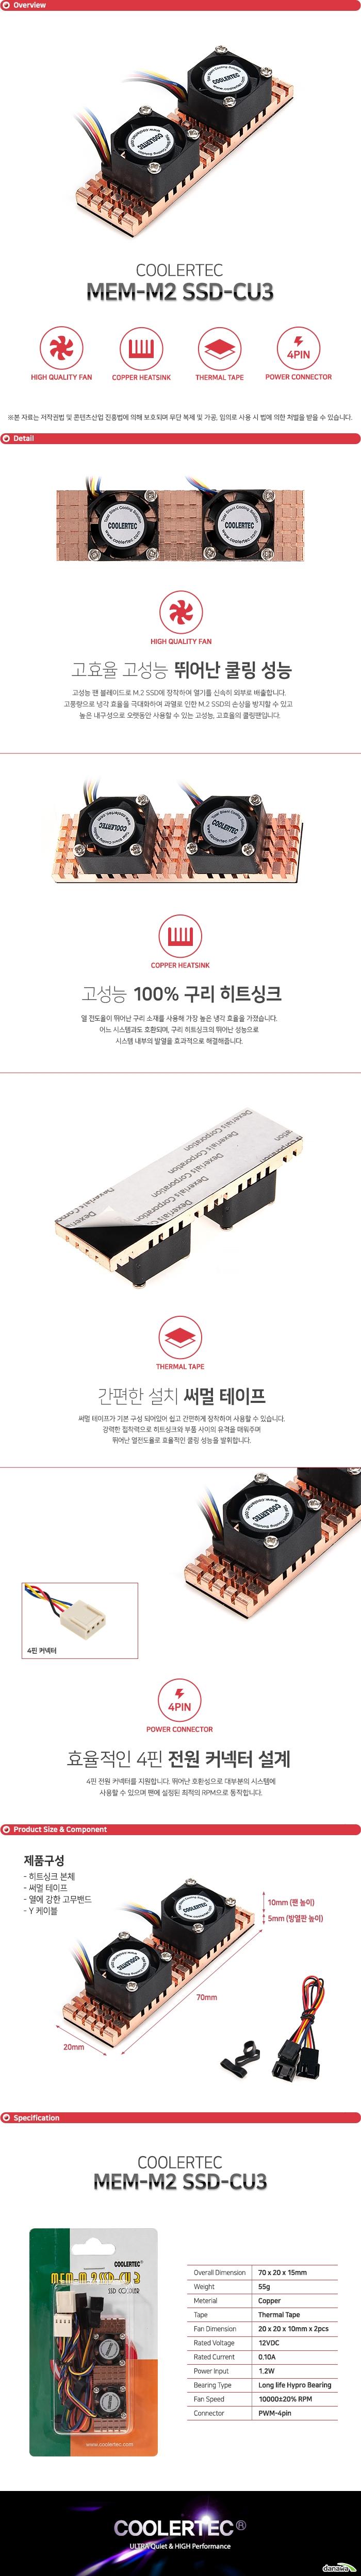 COOLERTEC MEM-M2 SSD-CU3